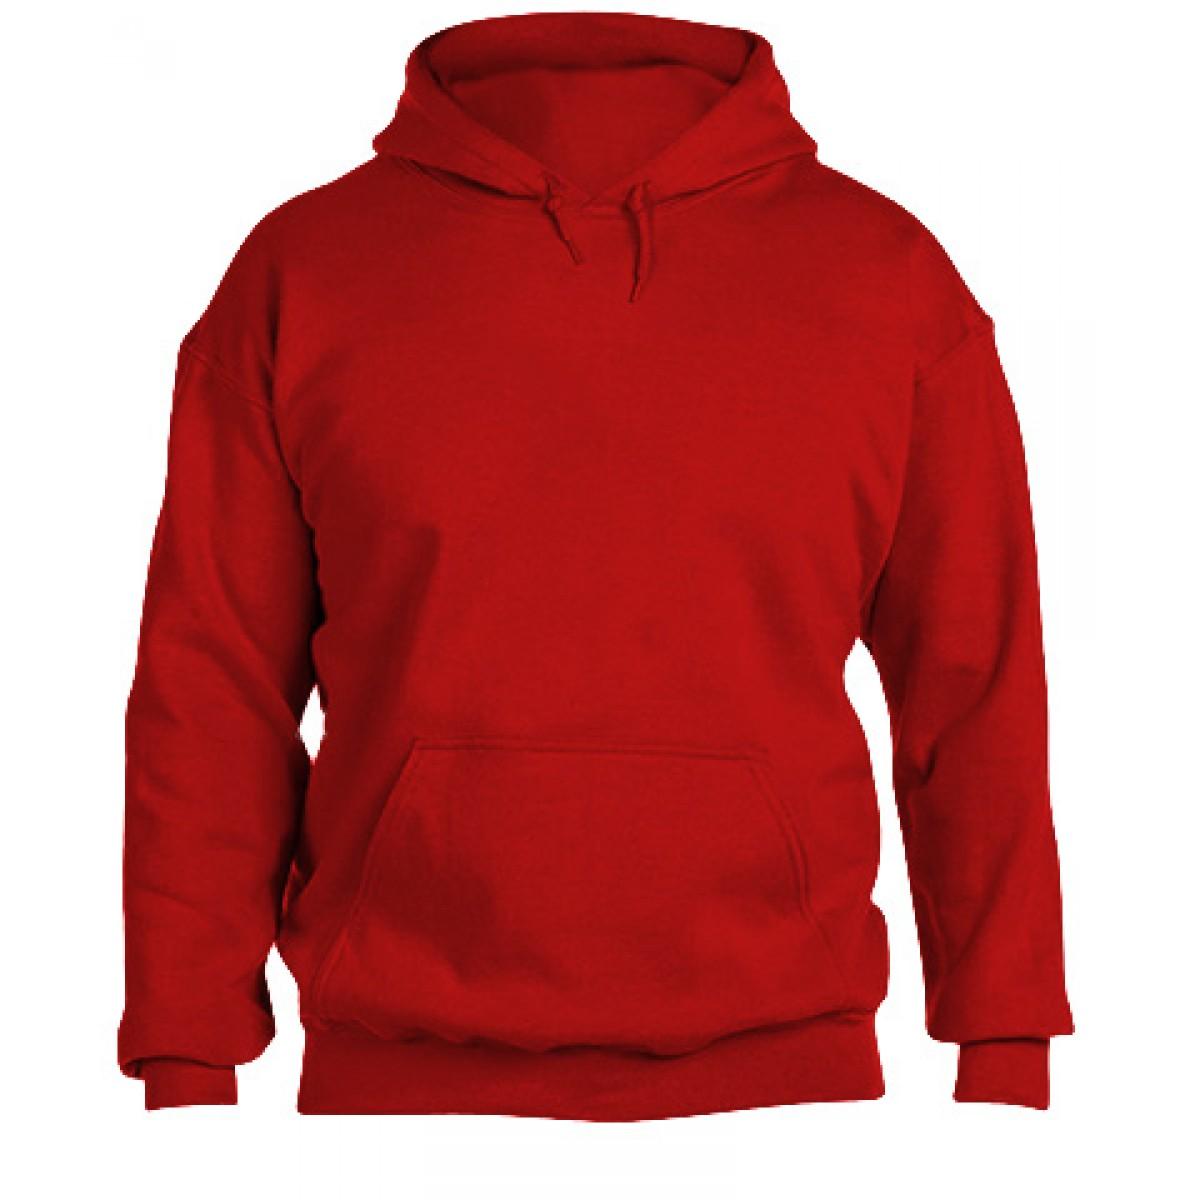 Hooded Sweatshirt 50/50 Heavy Blend -Red-3XL